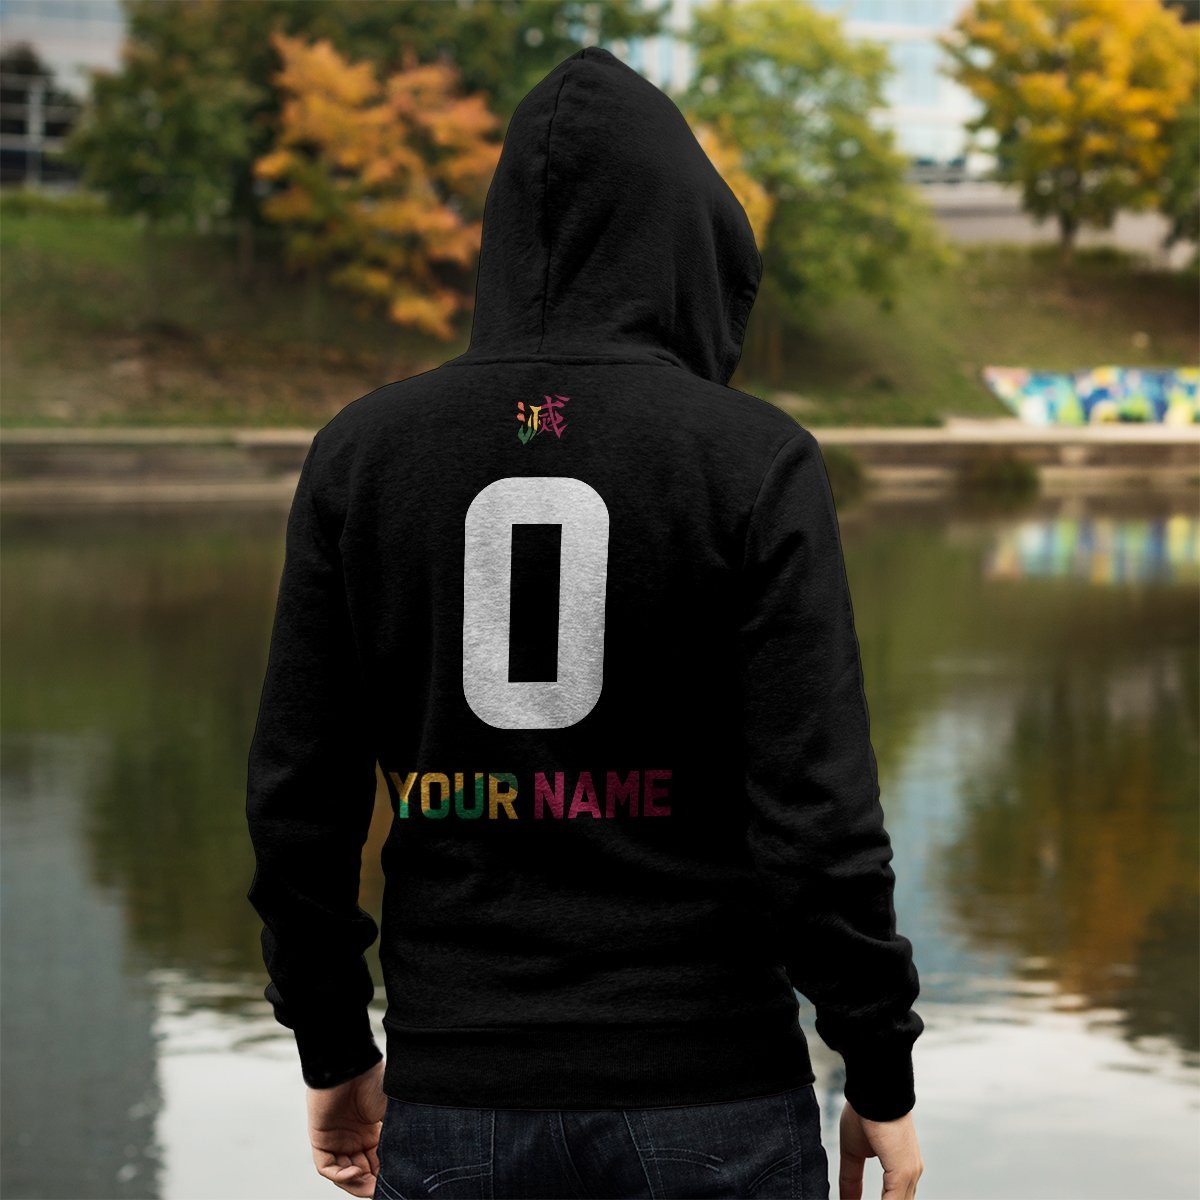 personalized tomioka giyu unisex zipped hoodie 133361 - Otaku Treat